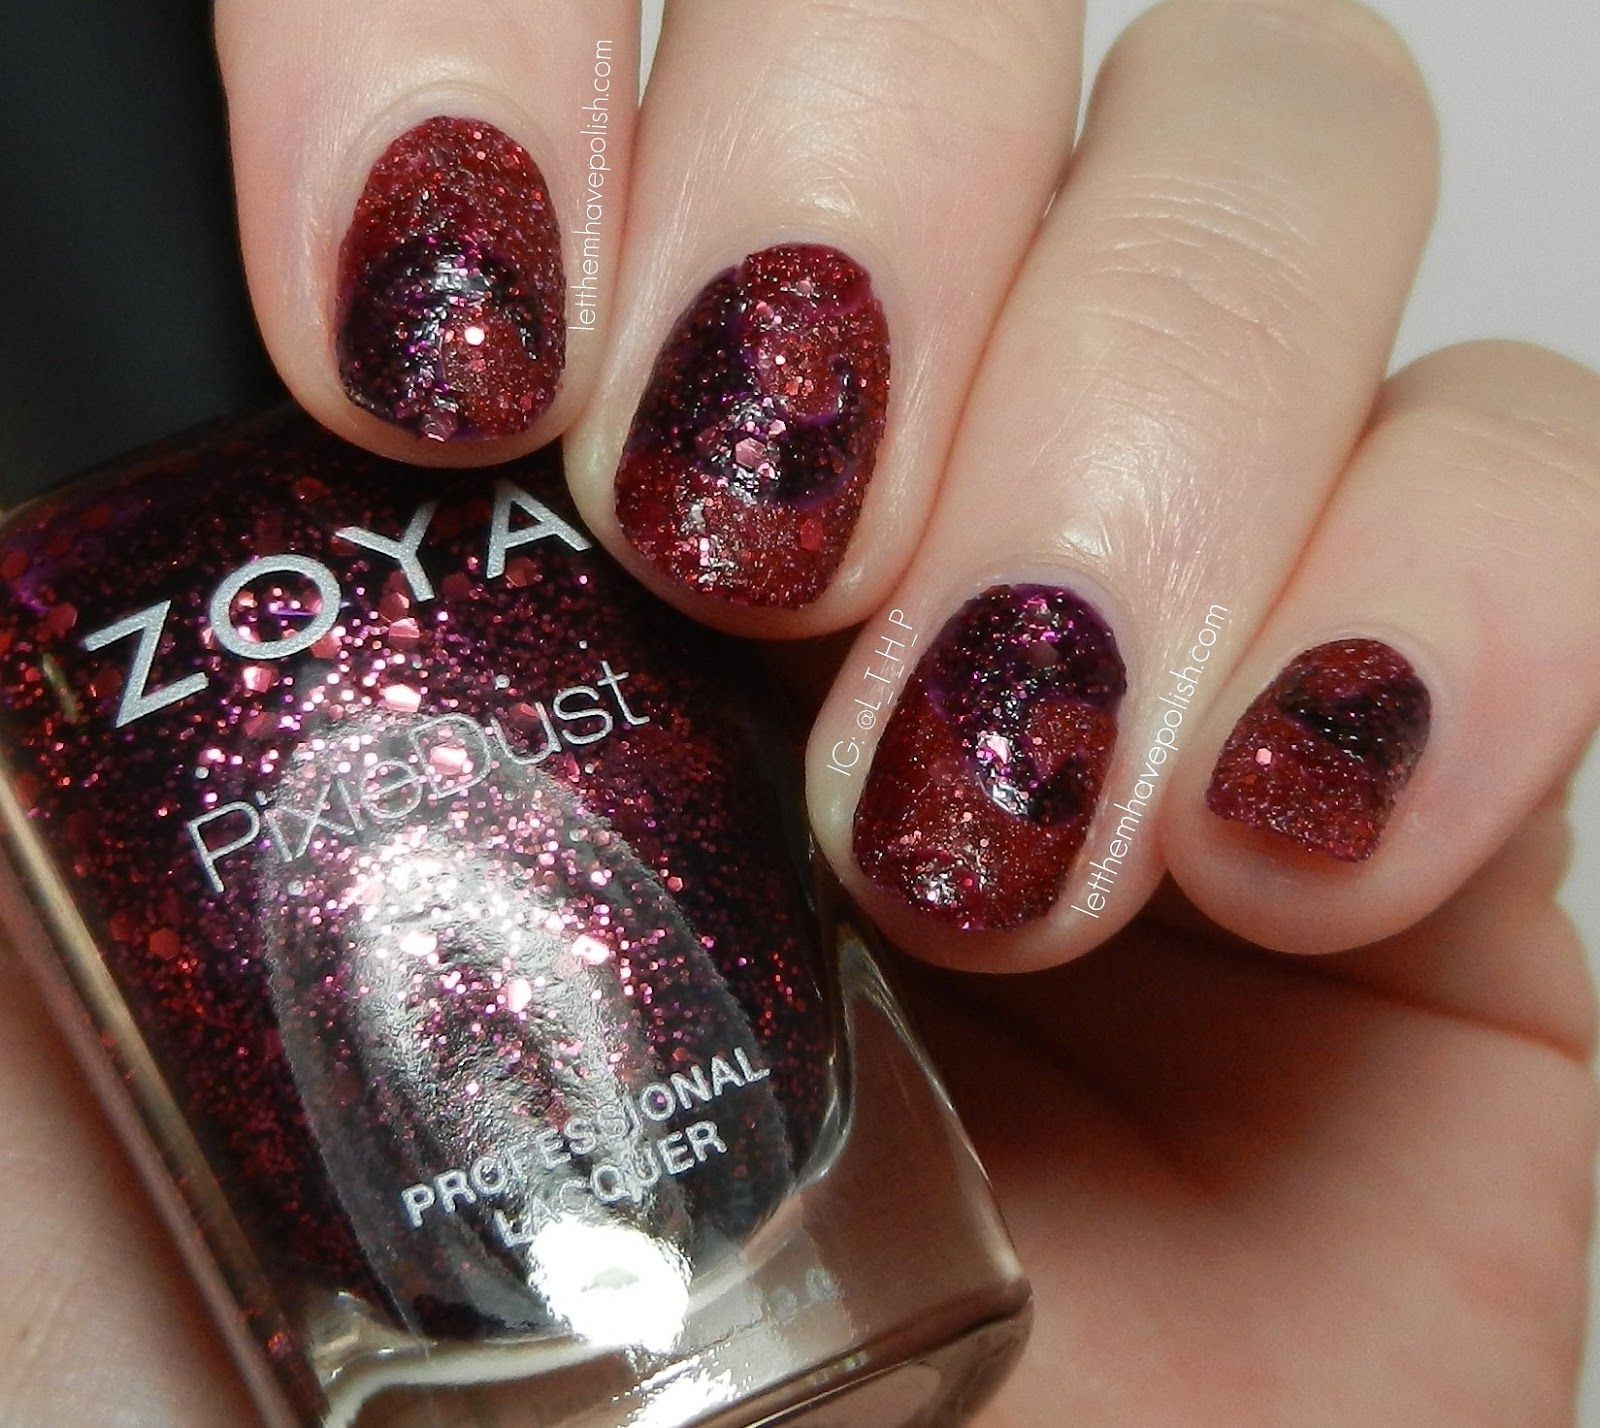 Zoya Ultra PixieDust Fall 2014 Polishes [Swatch] & [Review